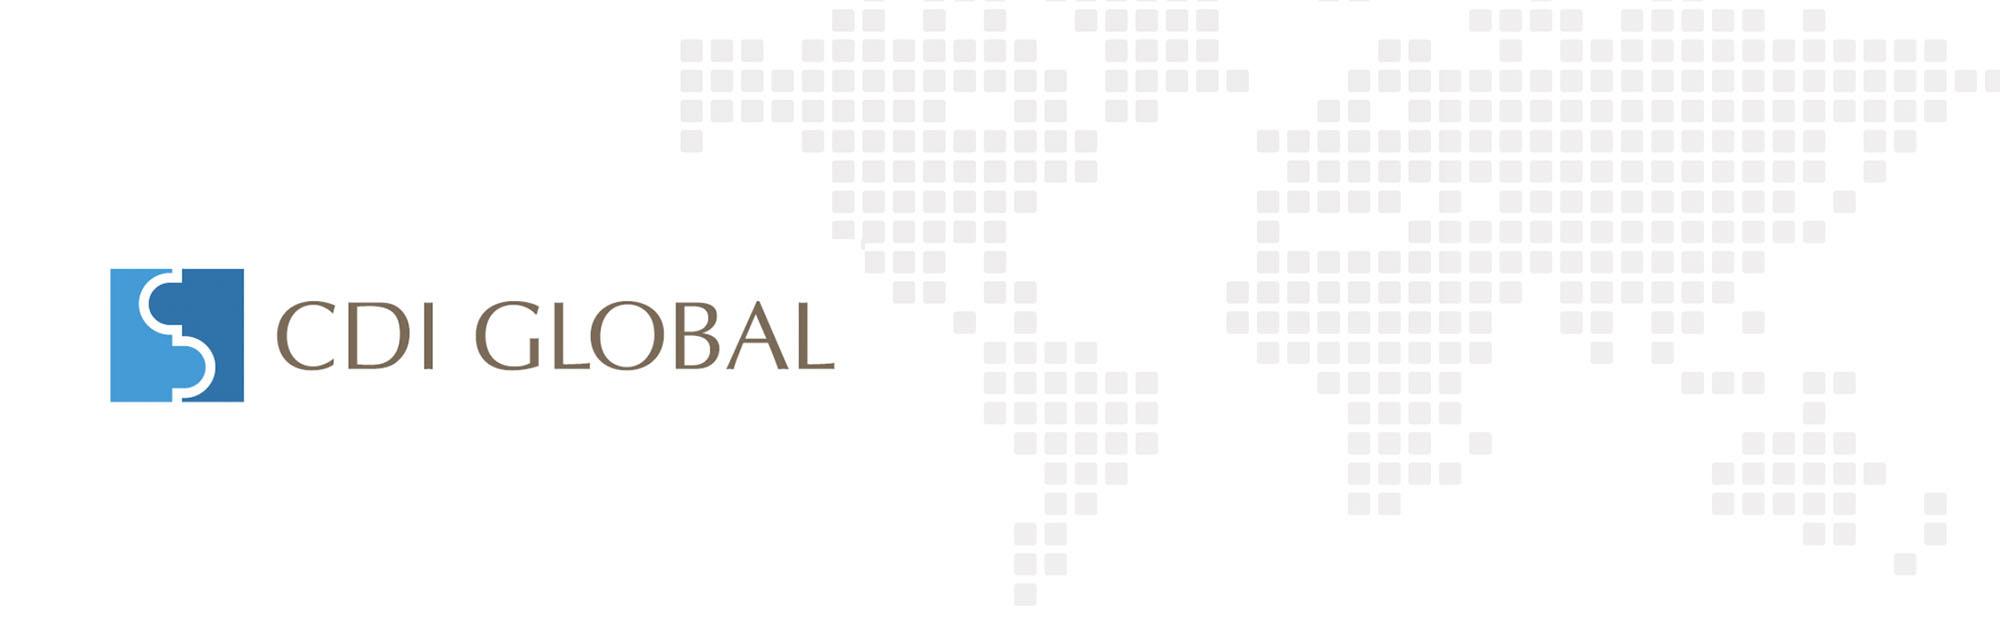 www.cdiglobal.com